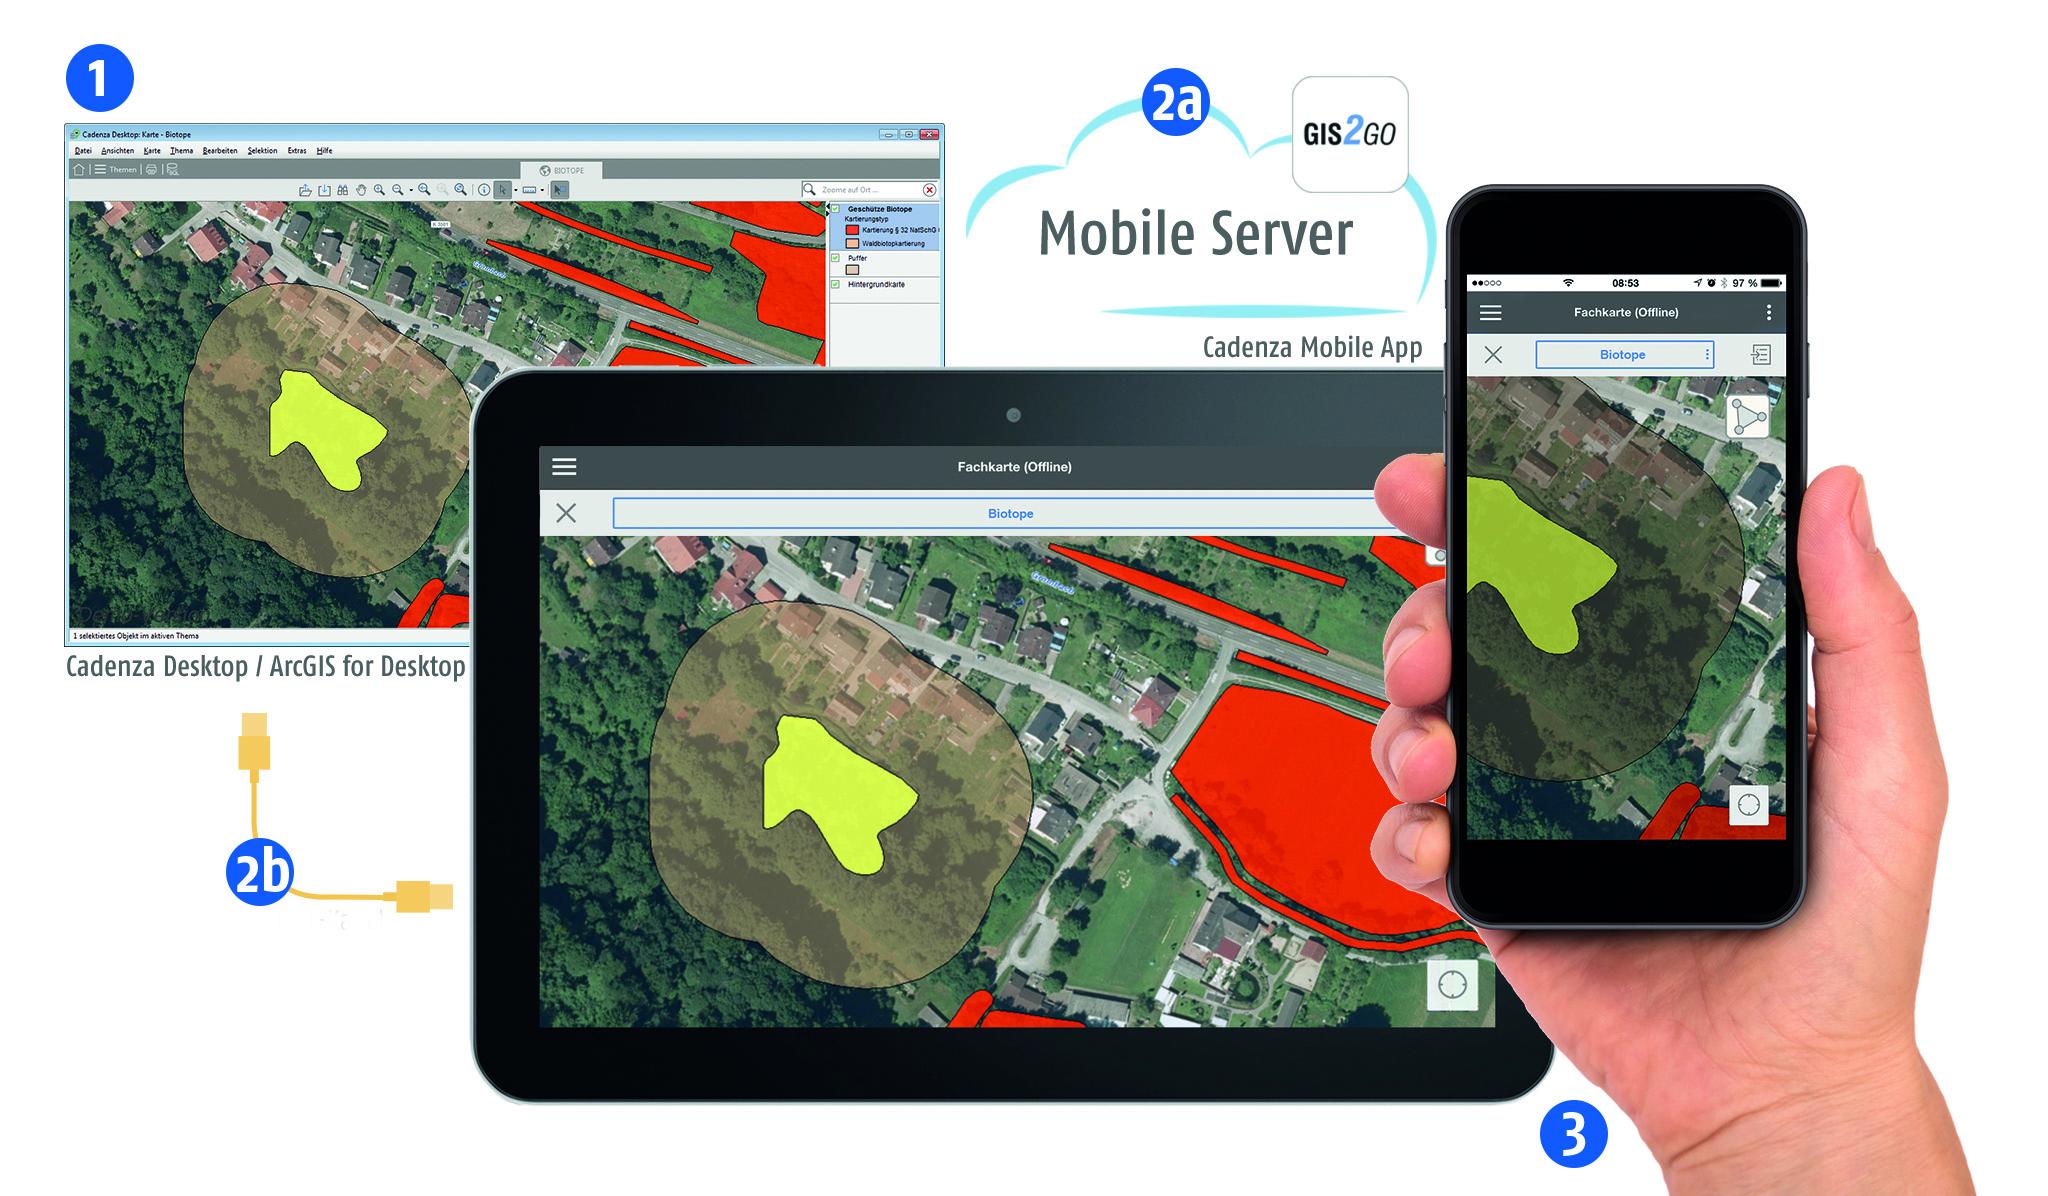 Abb. 3: Exportprozess der Daten aus Cadenza Desktop auf das Mobilgerät